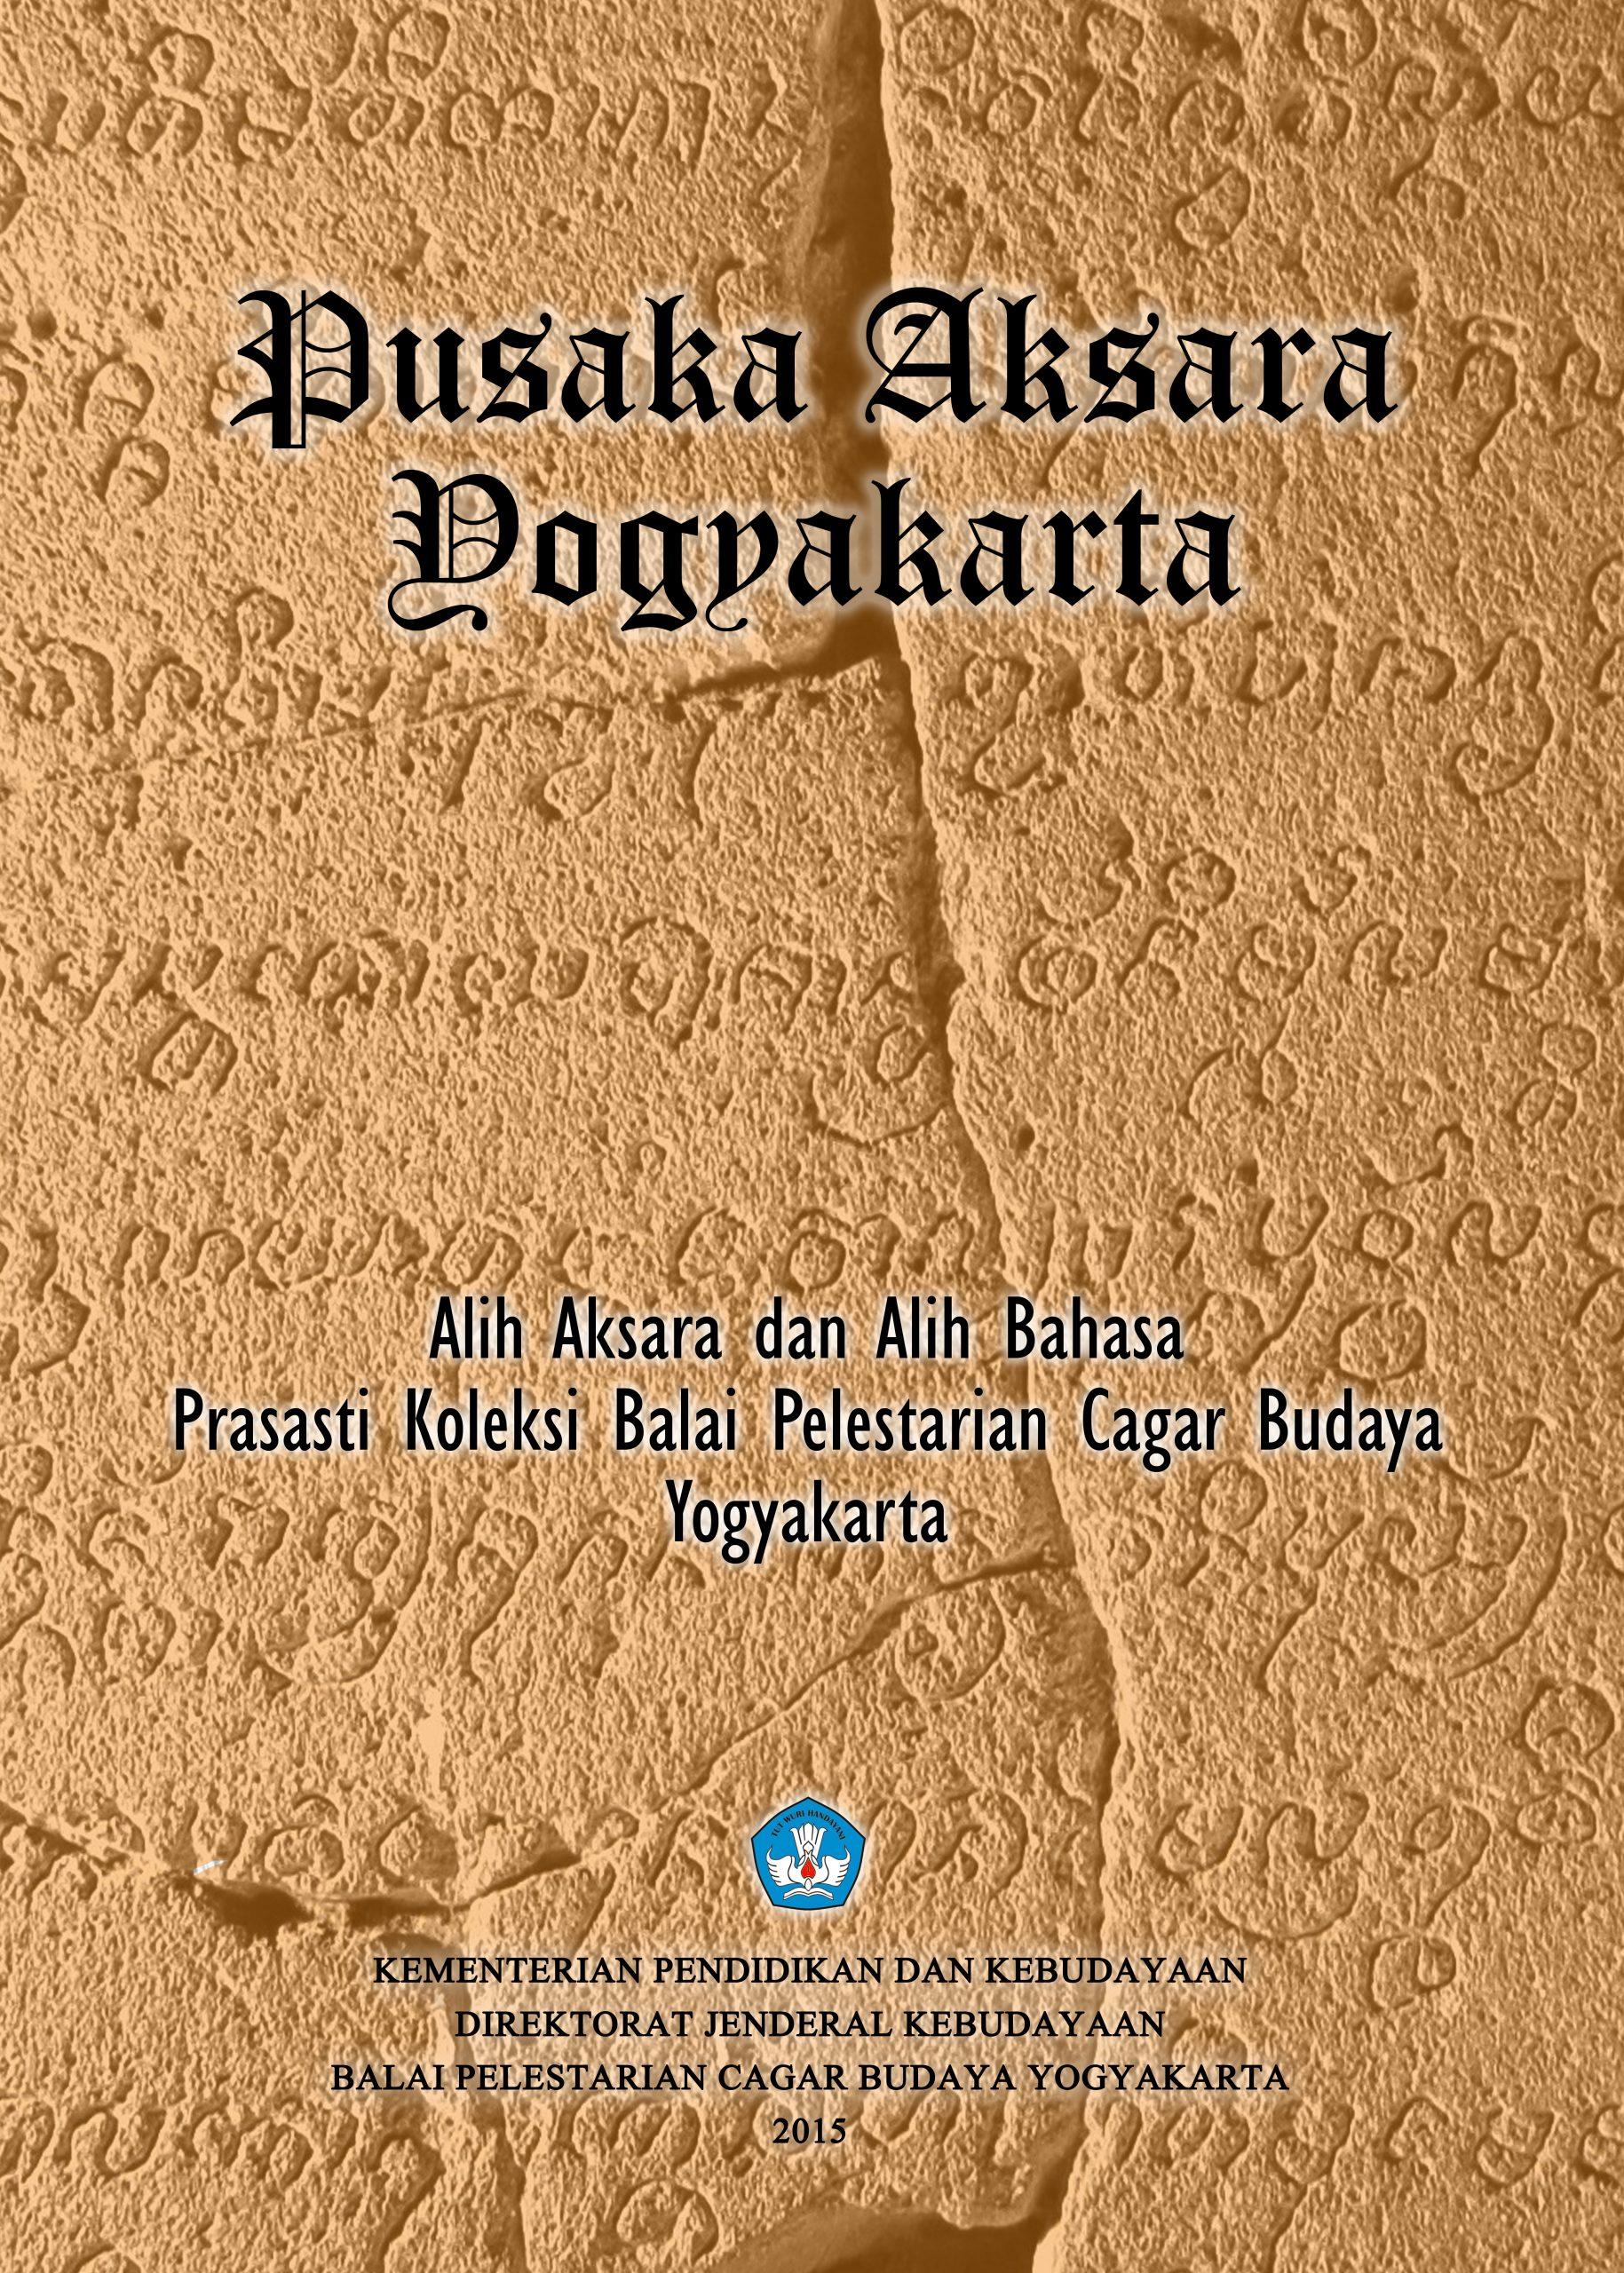 Read more about the article Pusaka Aksara Yogyakarta